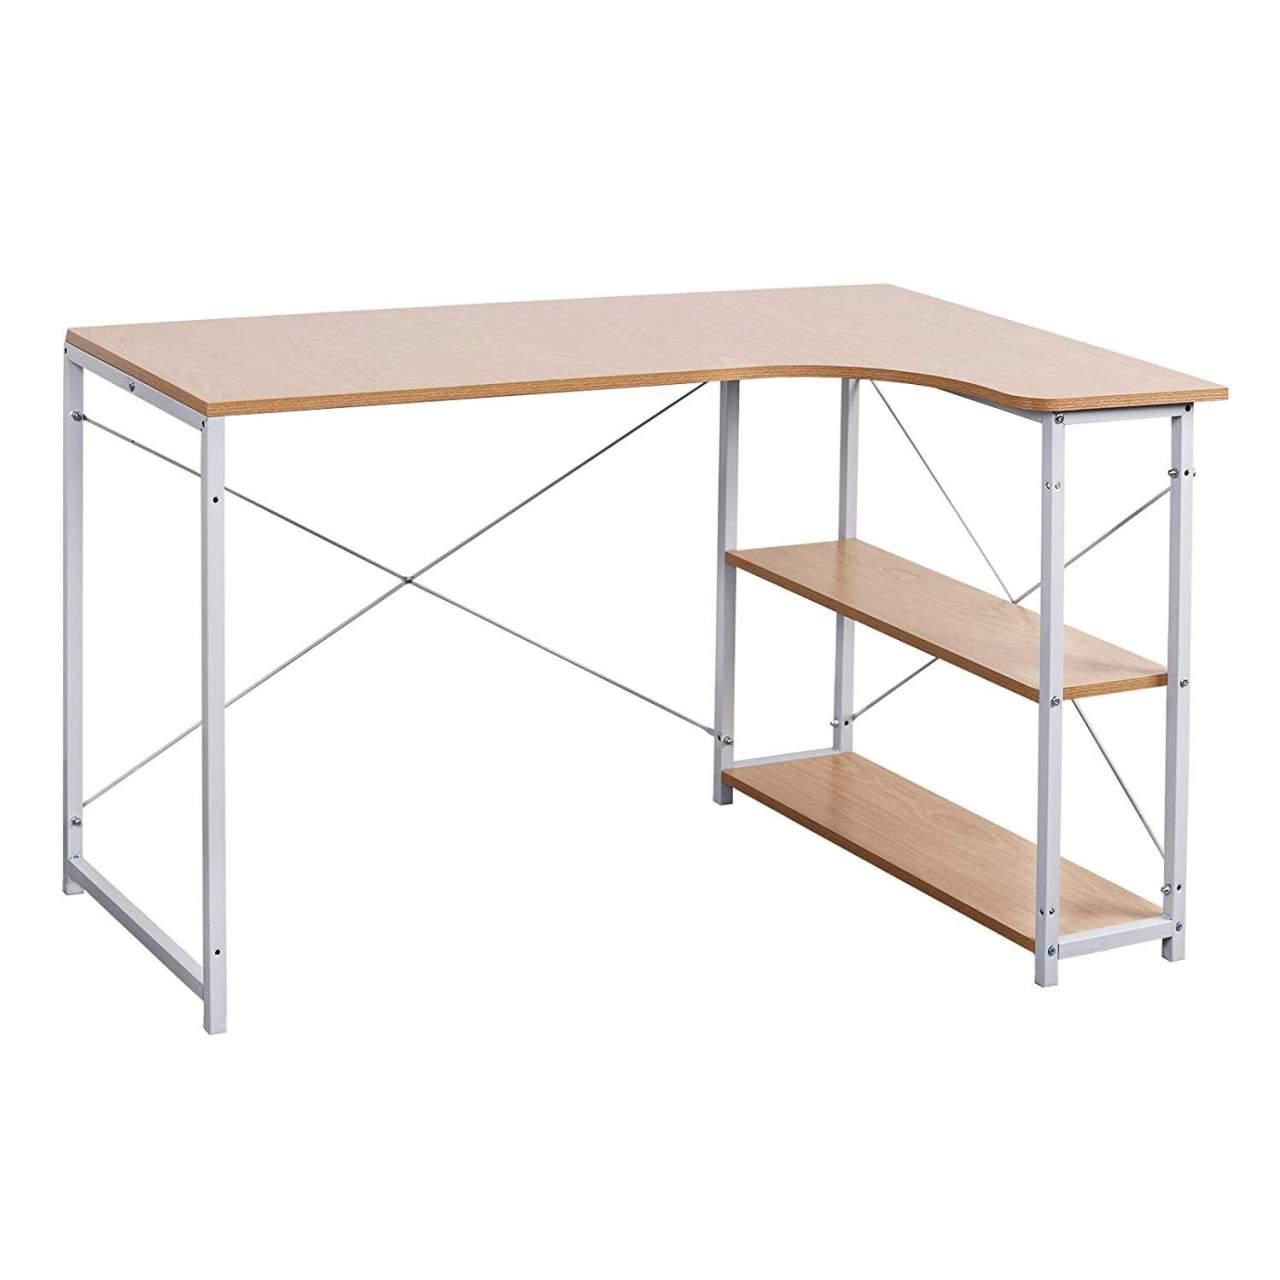 - Computer Desk With Two Shelves Woltu.eu